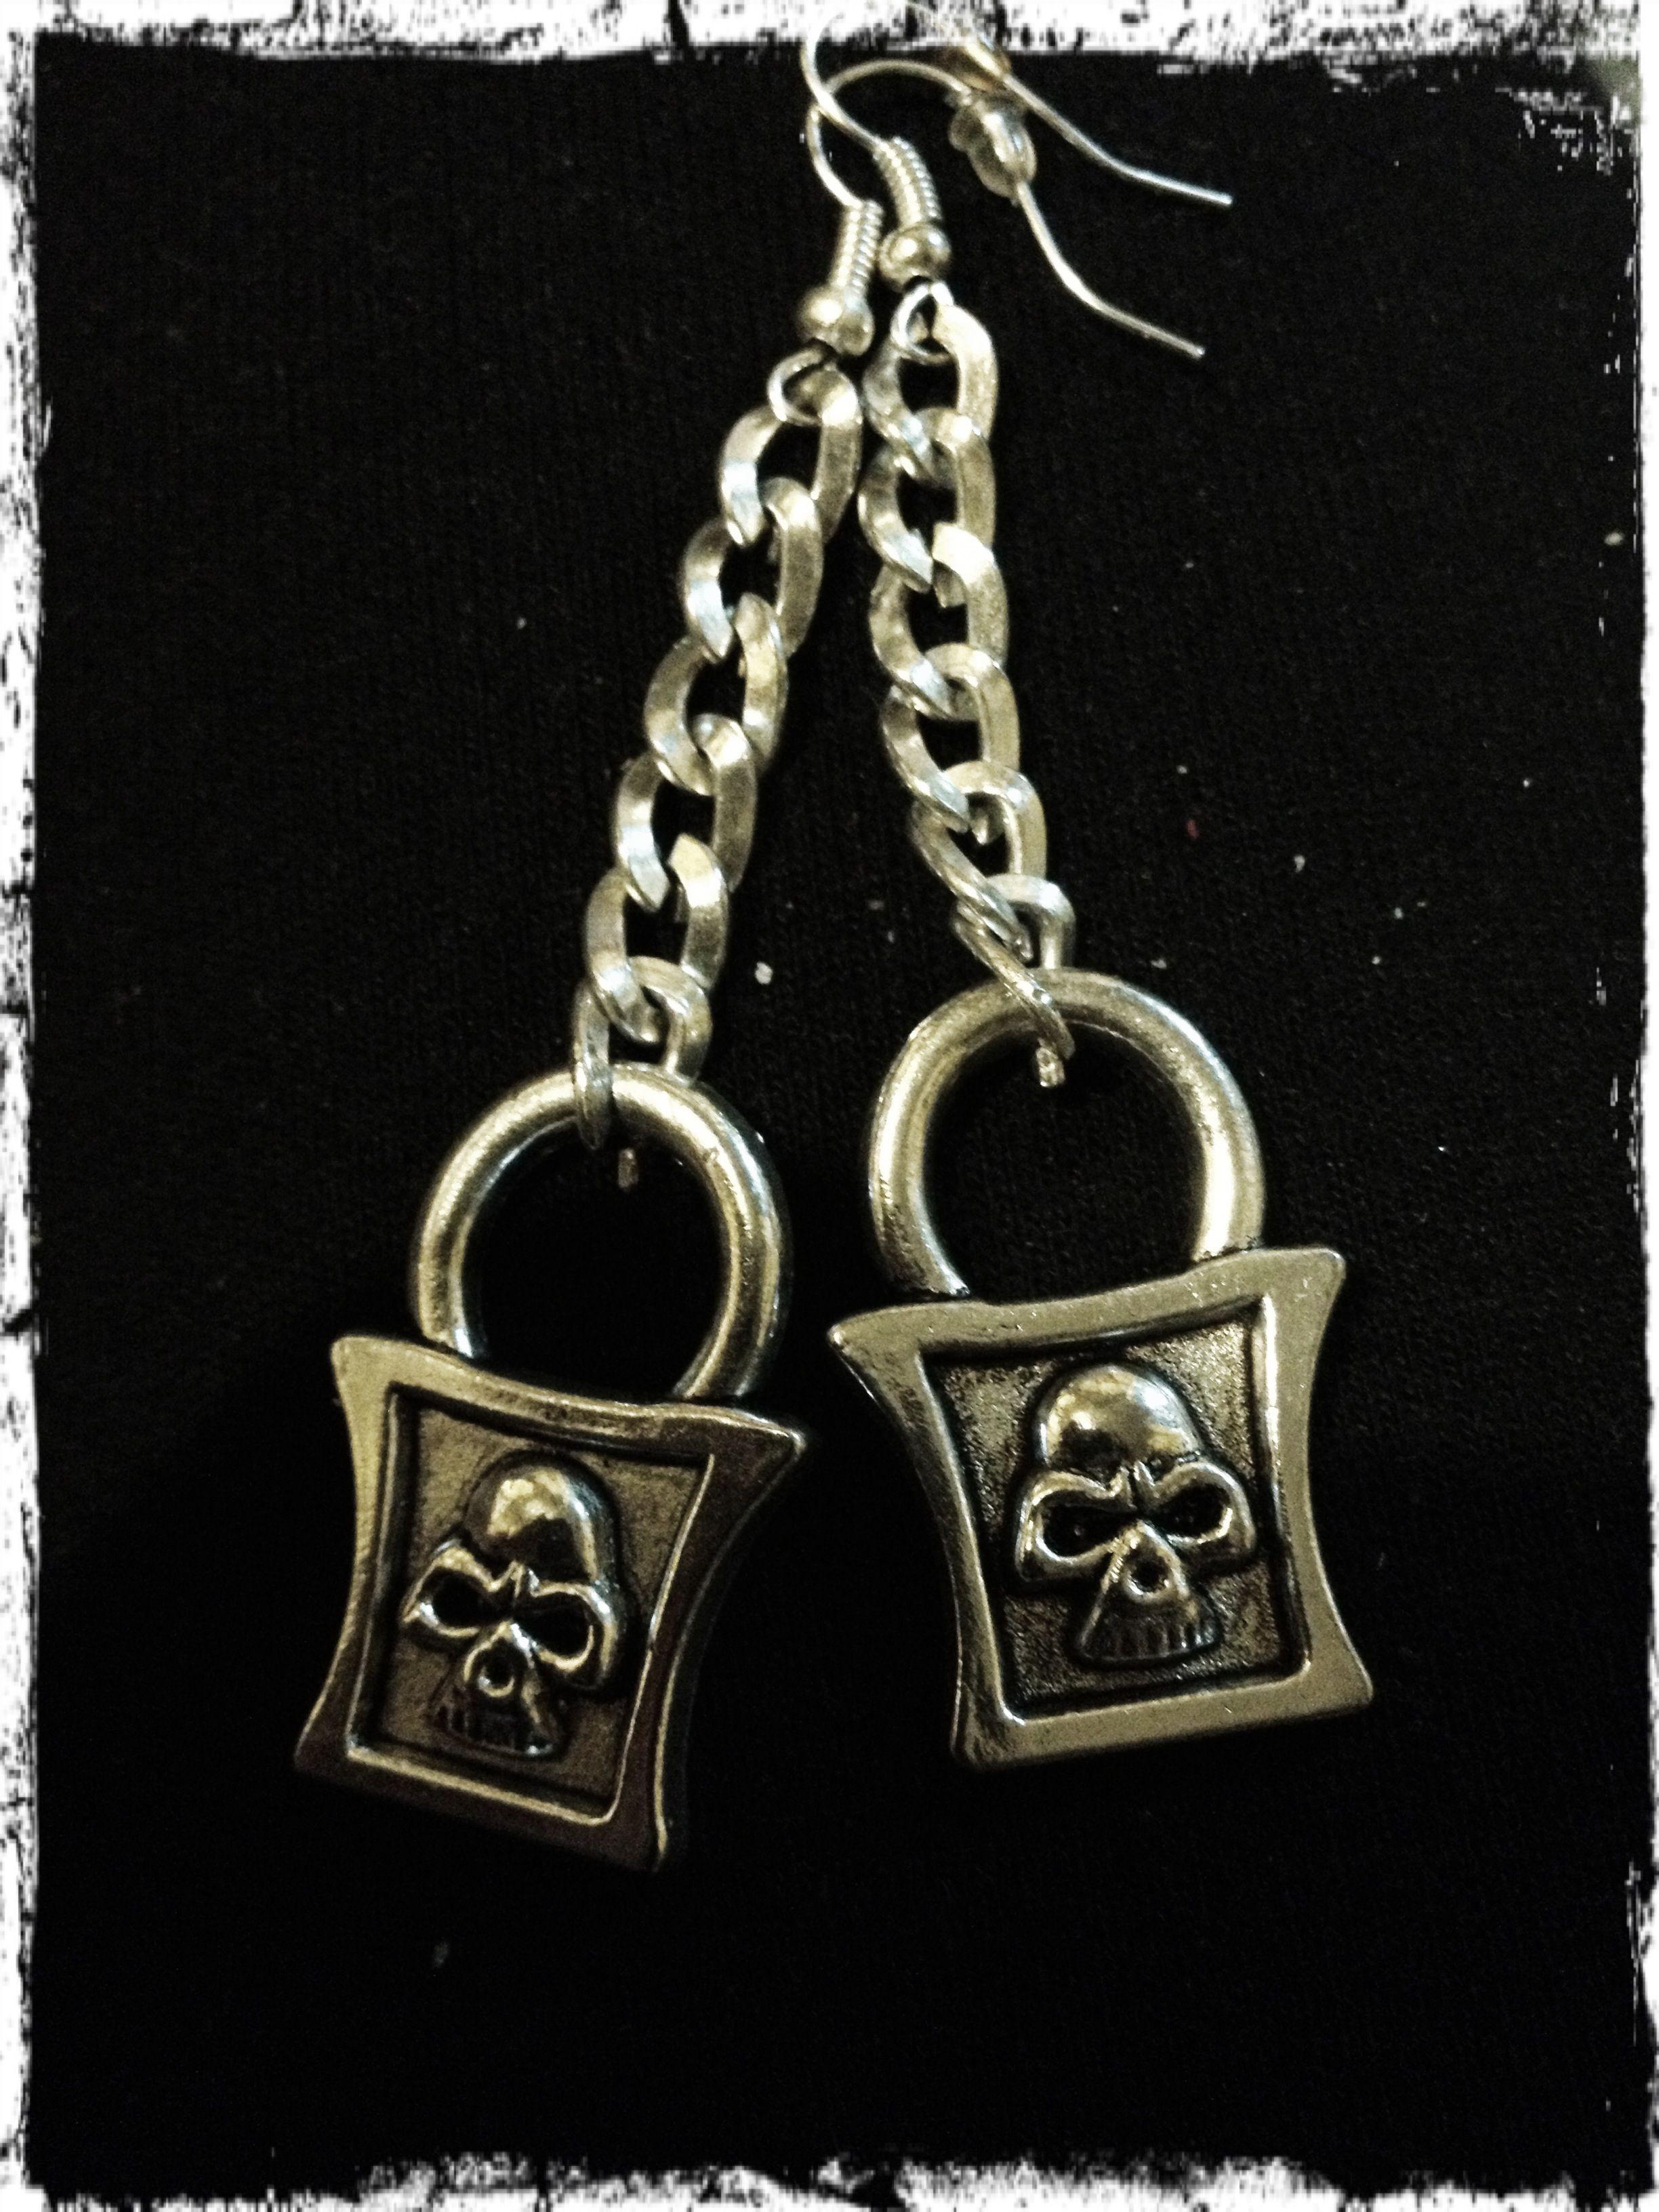 Amo mis nuevos aretes creación de Yoshi Reyes // I loooooove my new earrings creations of Yoshi Reyes